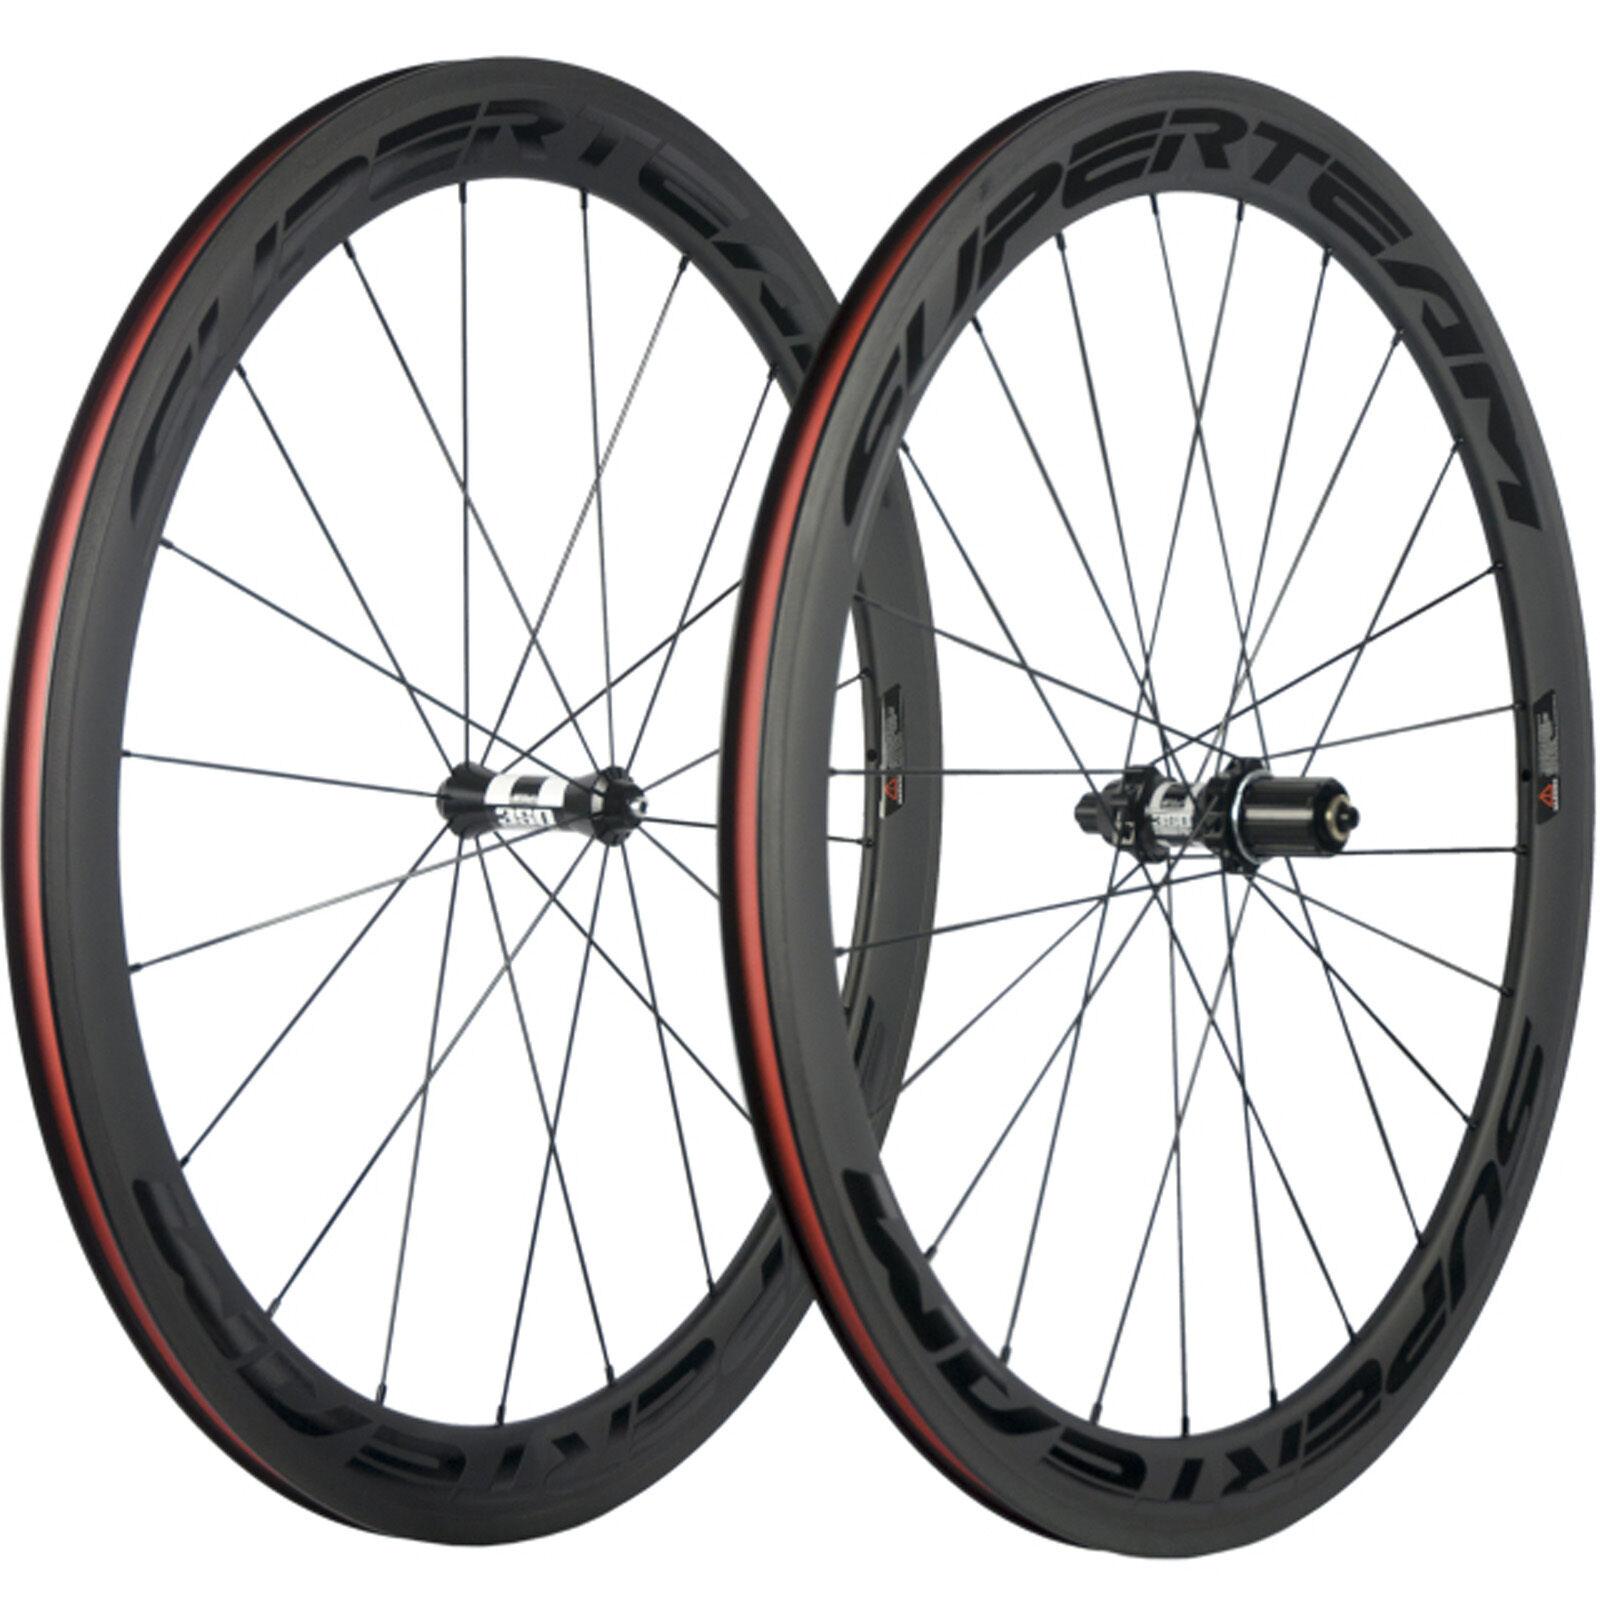 SUPERTEAM 50mm Clincher Carbon Road Bike Wheelset DT350  Hub Bicycle Carbon Wheel  save 35% - 70% off